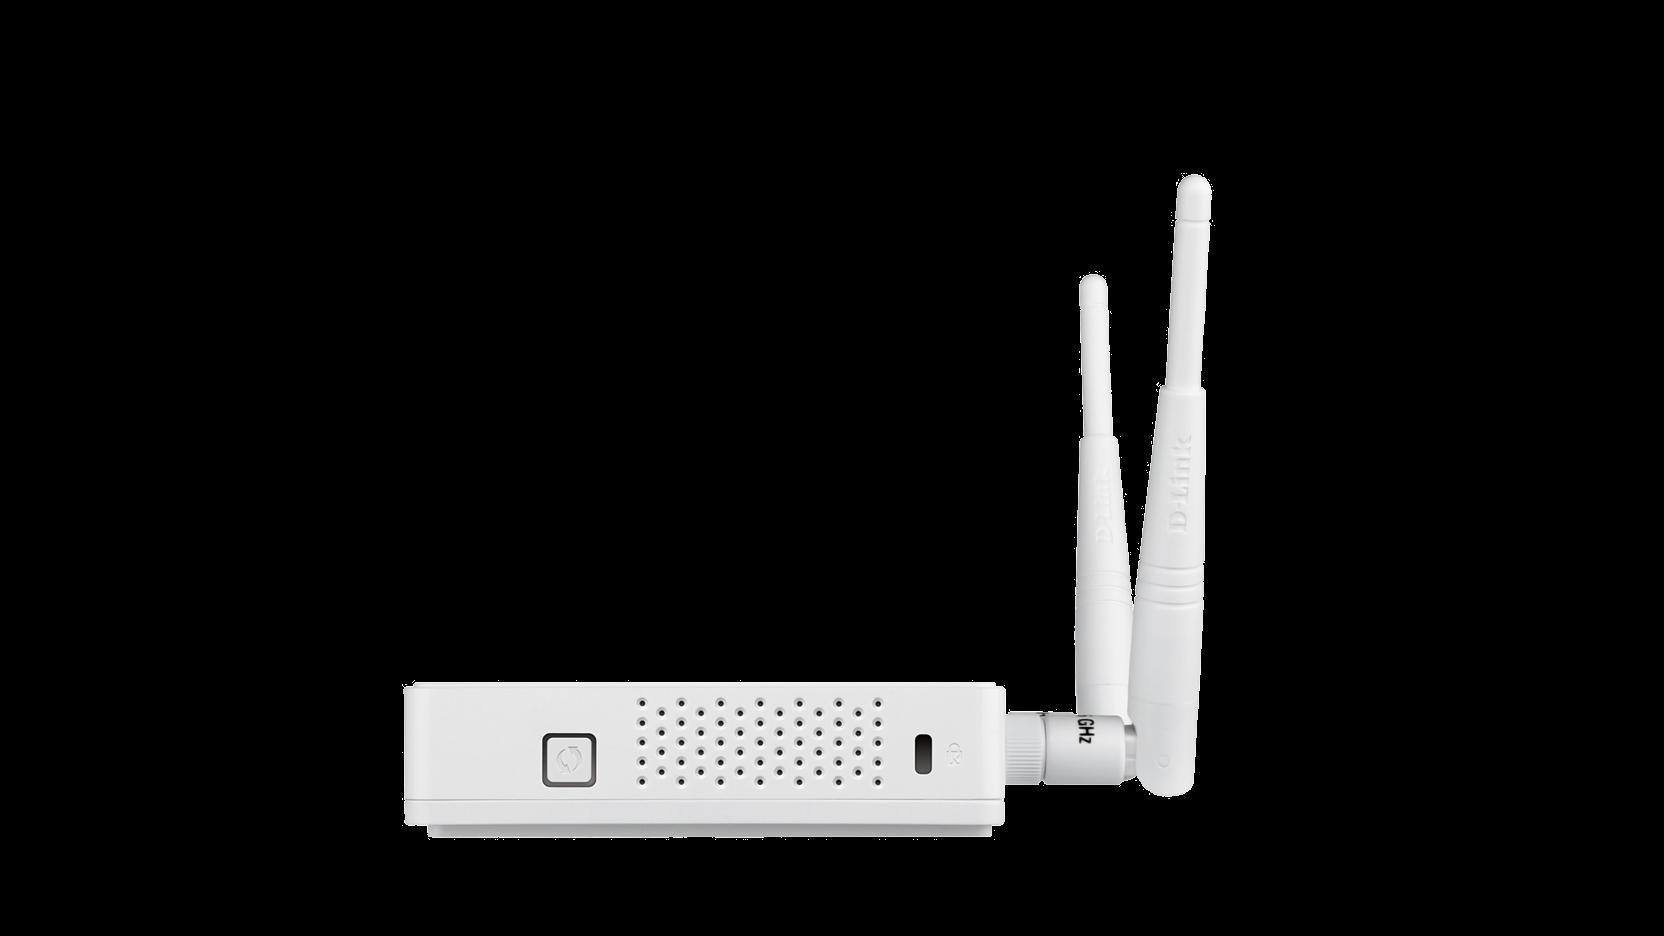 DLink Wireless Access Point DAP-1665